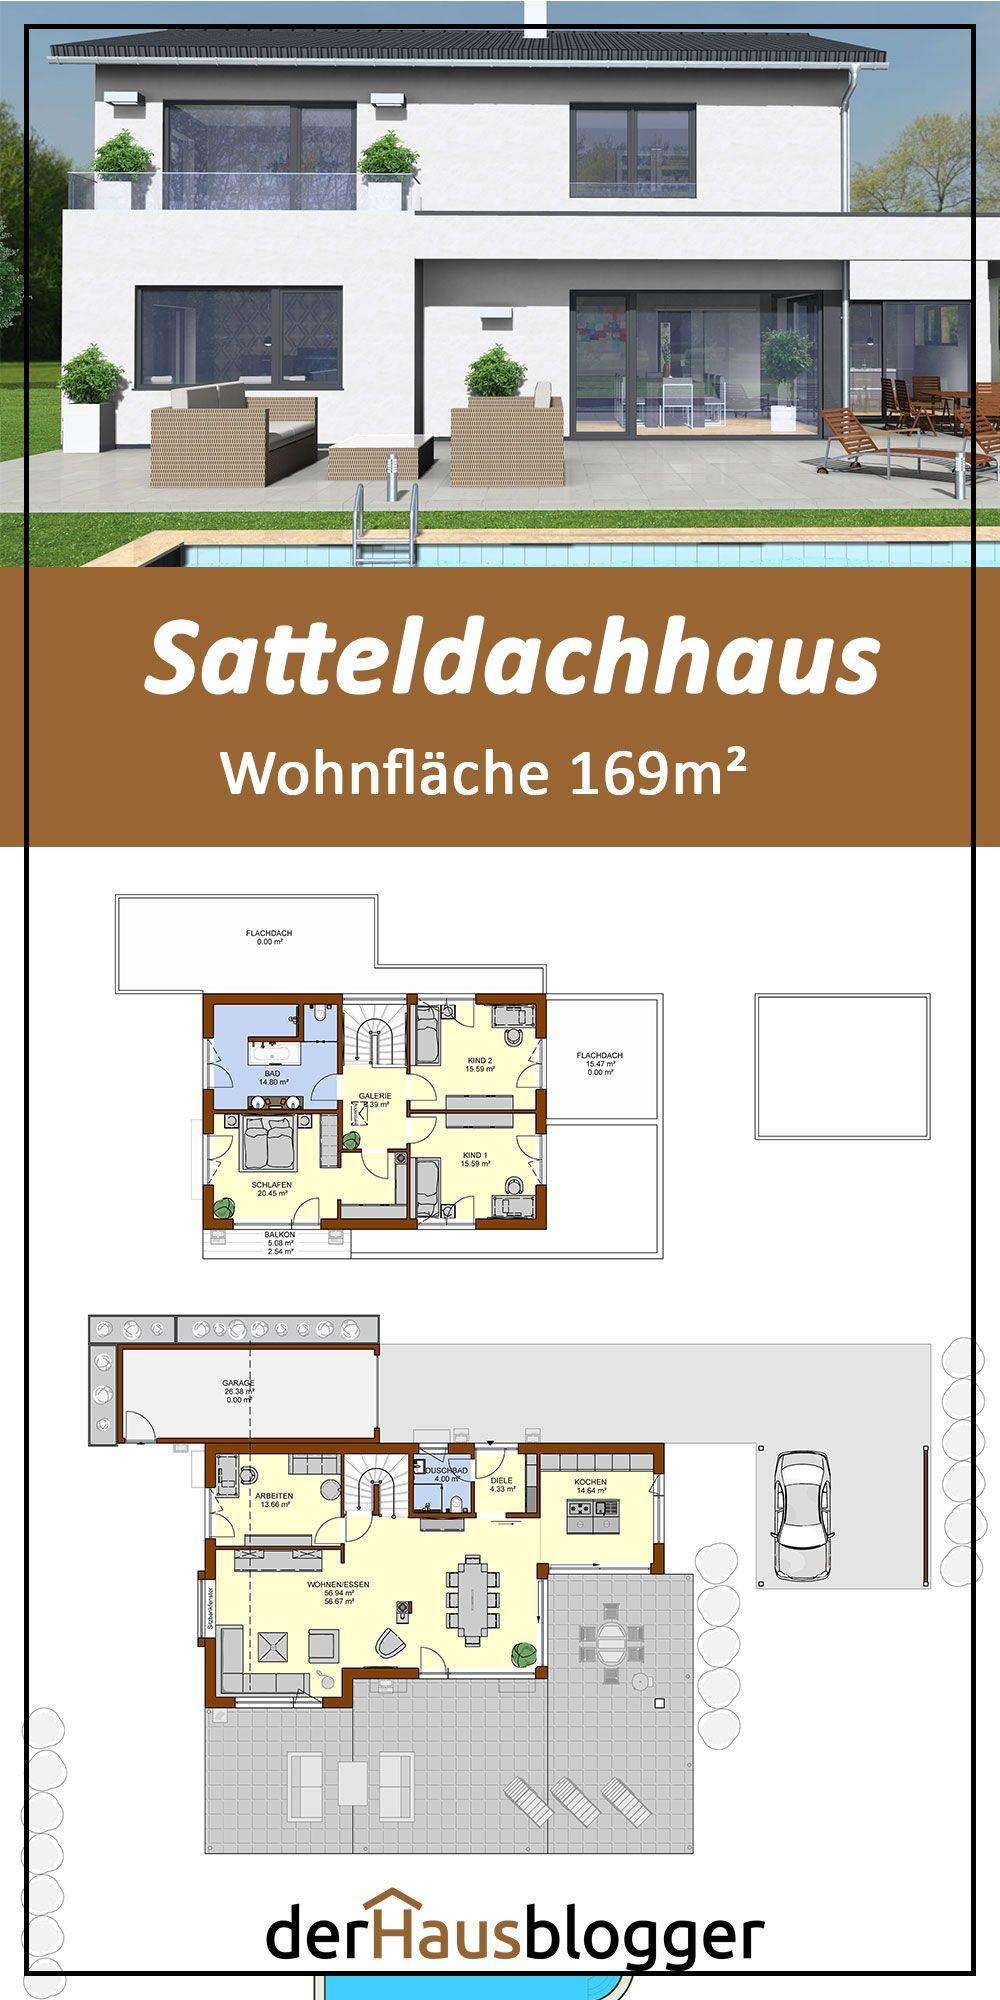 Grundriss Satteldachhaus 169m2